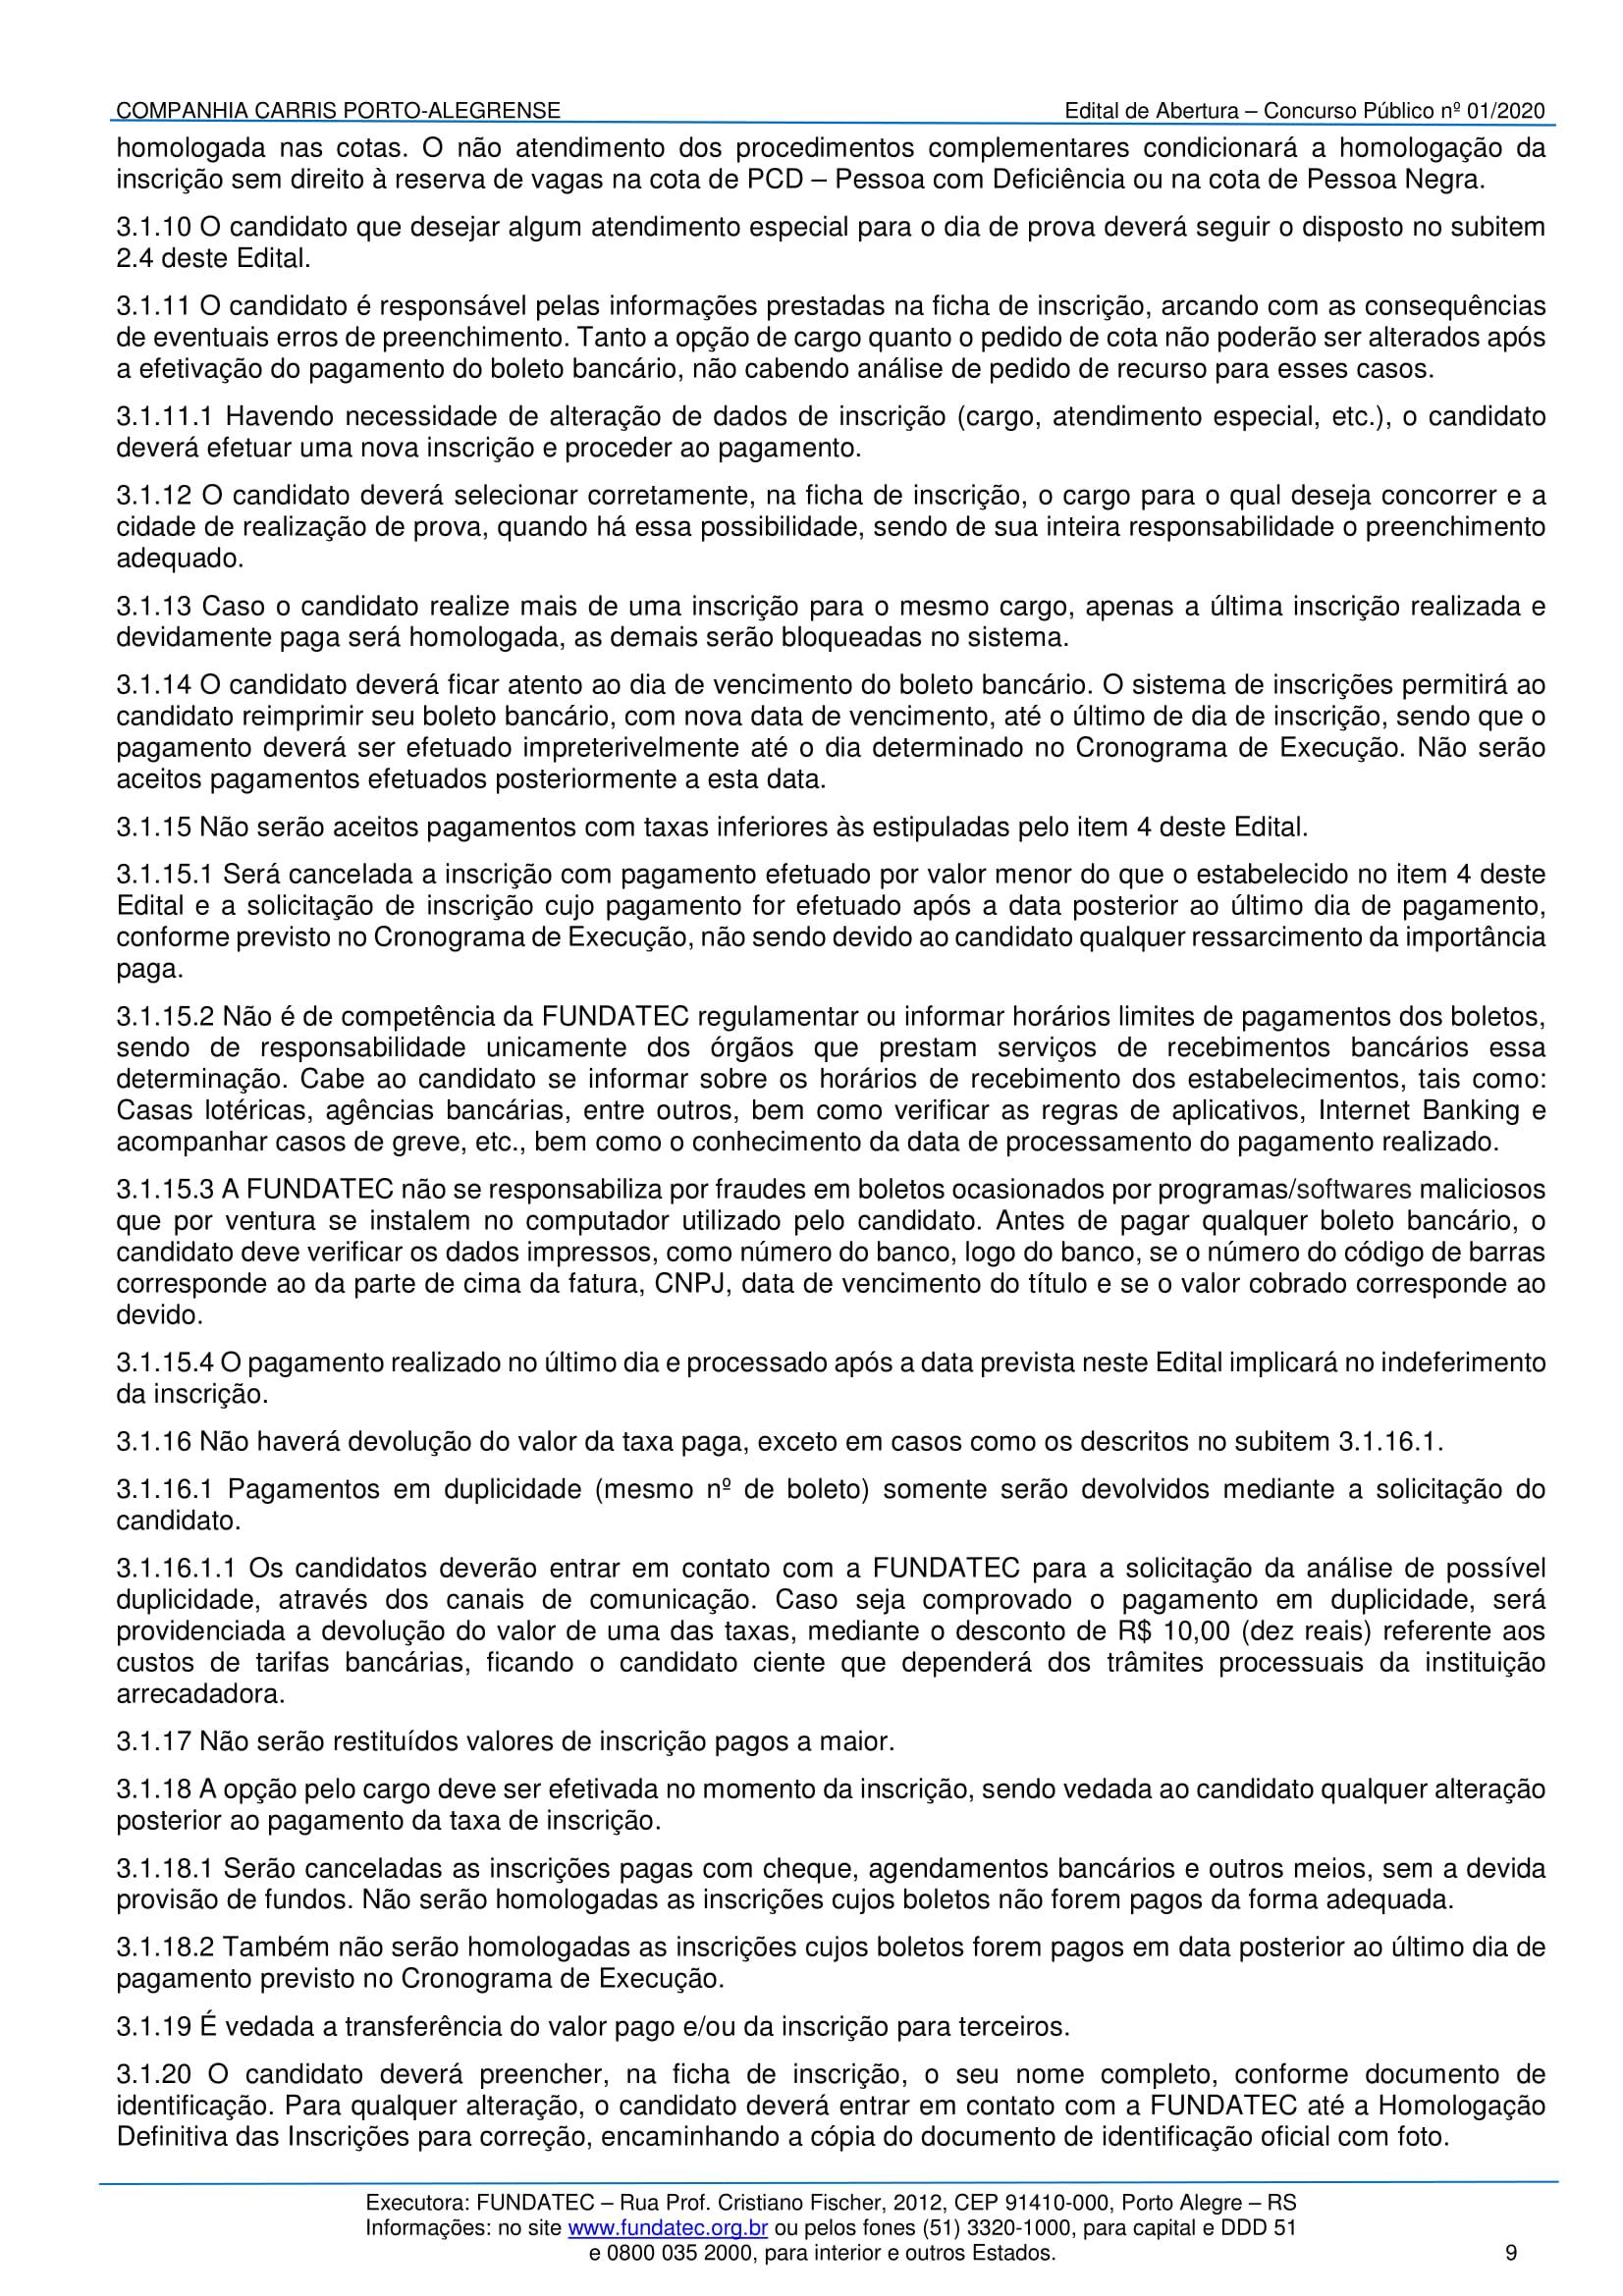 auditor-09